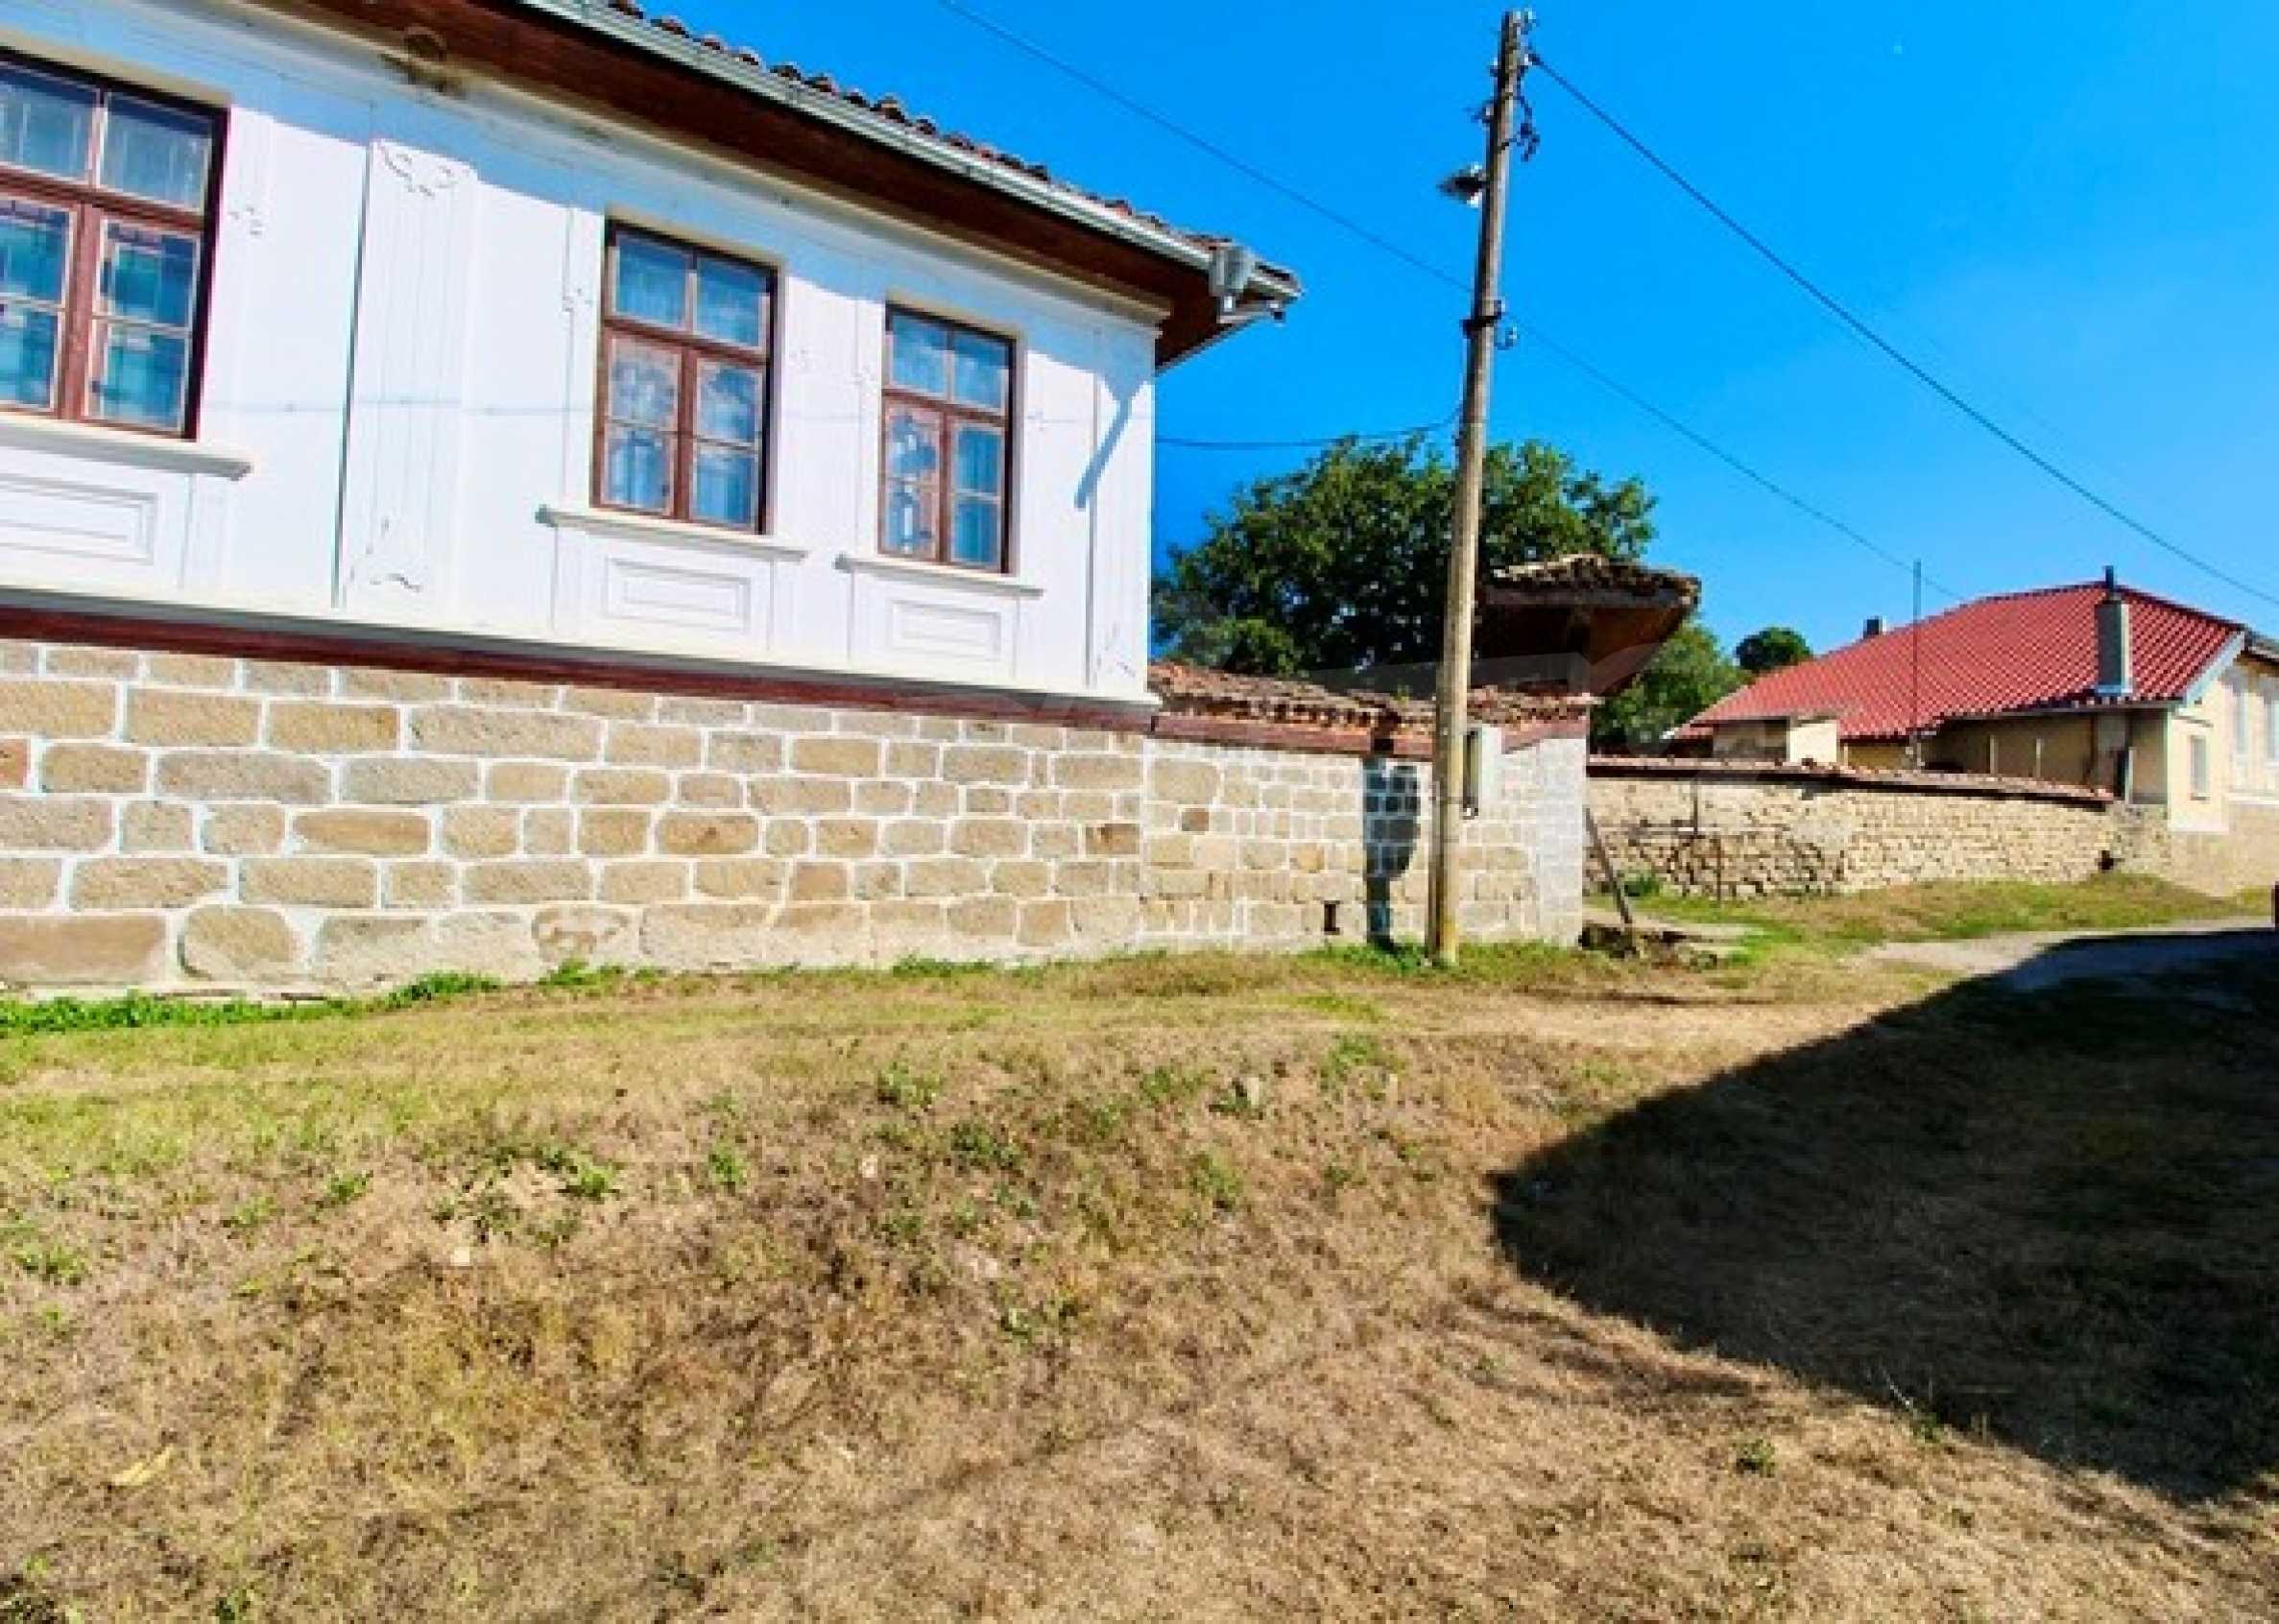 Lovely old house just 17 km away from Veliko Tarnovo 38